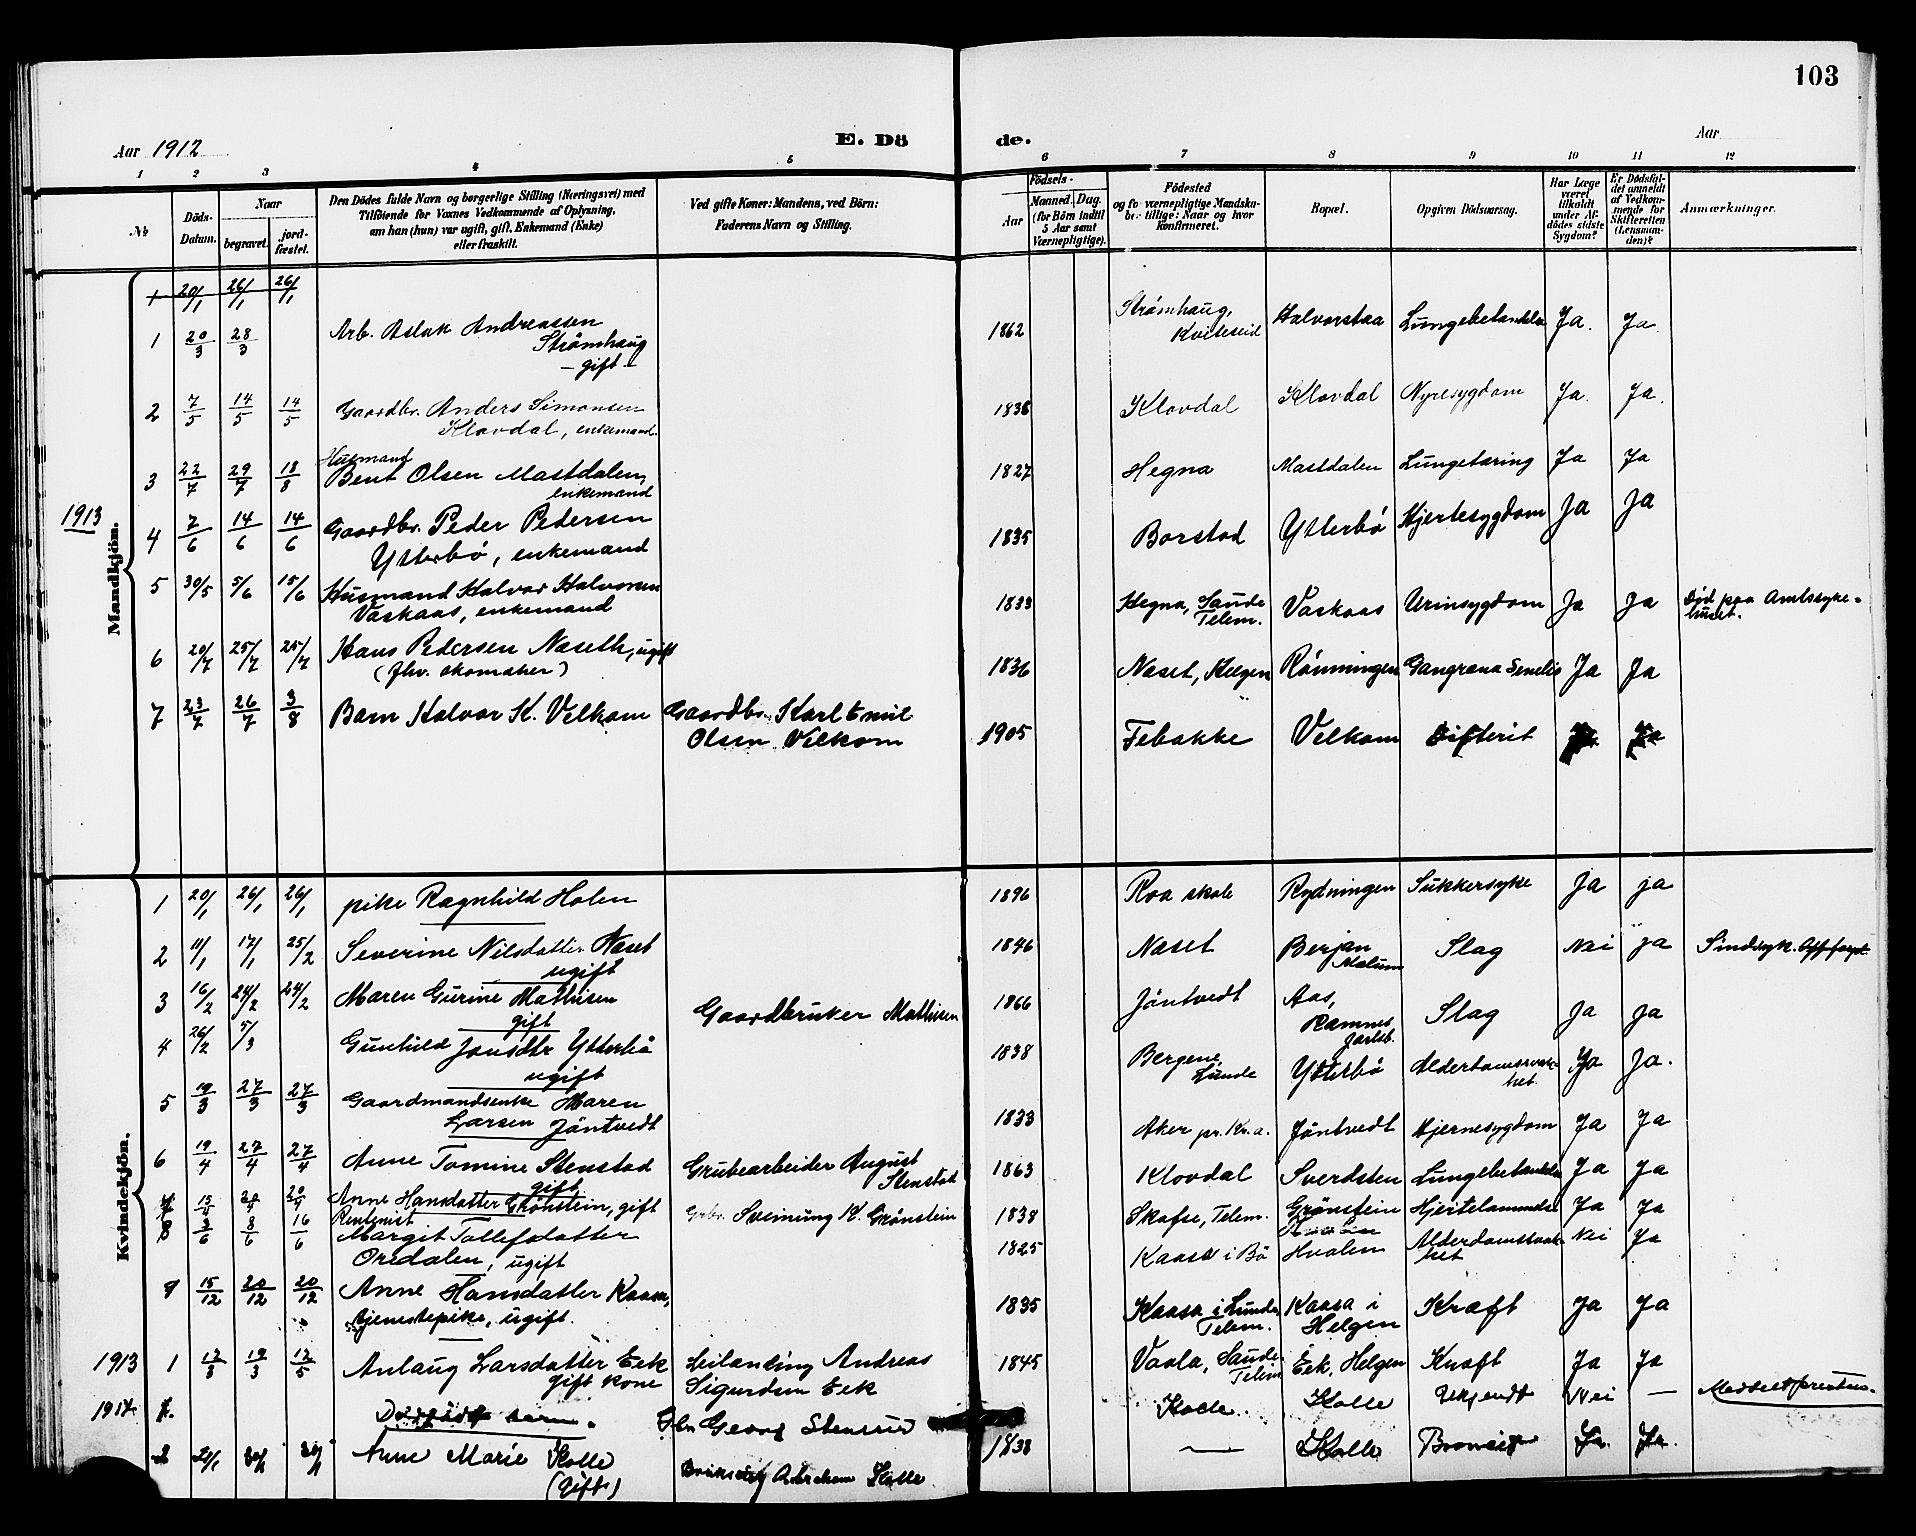 SAKO, Holla kirkebøker, G/Gb/L0002: Klokkerbok nr. II 2, 1897-1913, s. 103